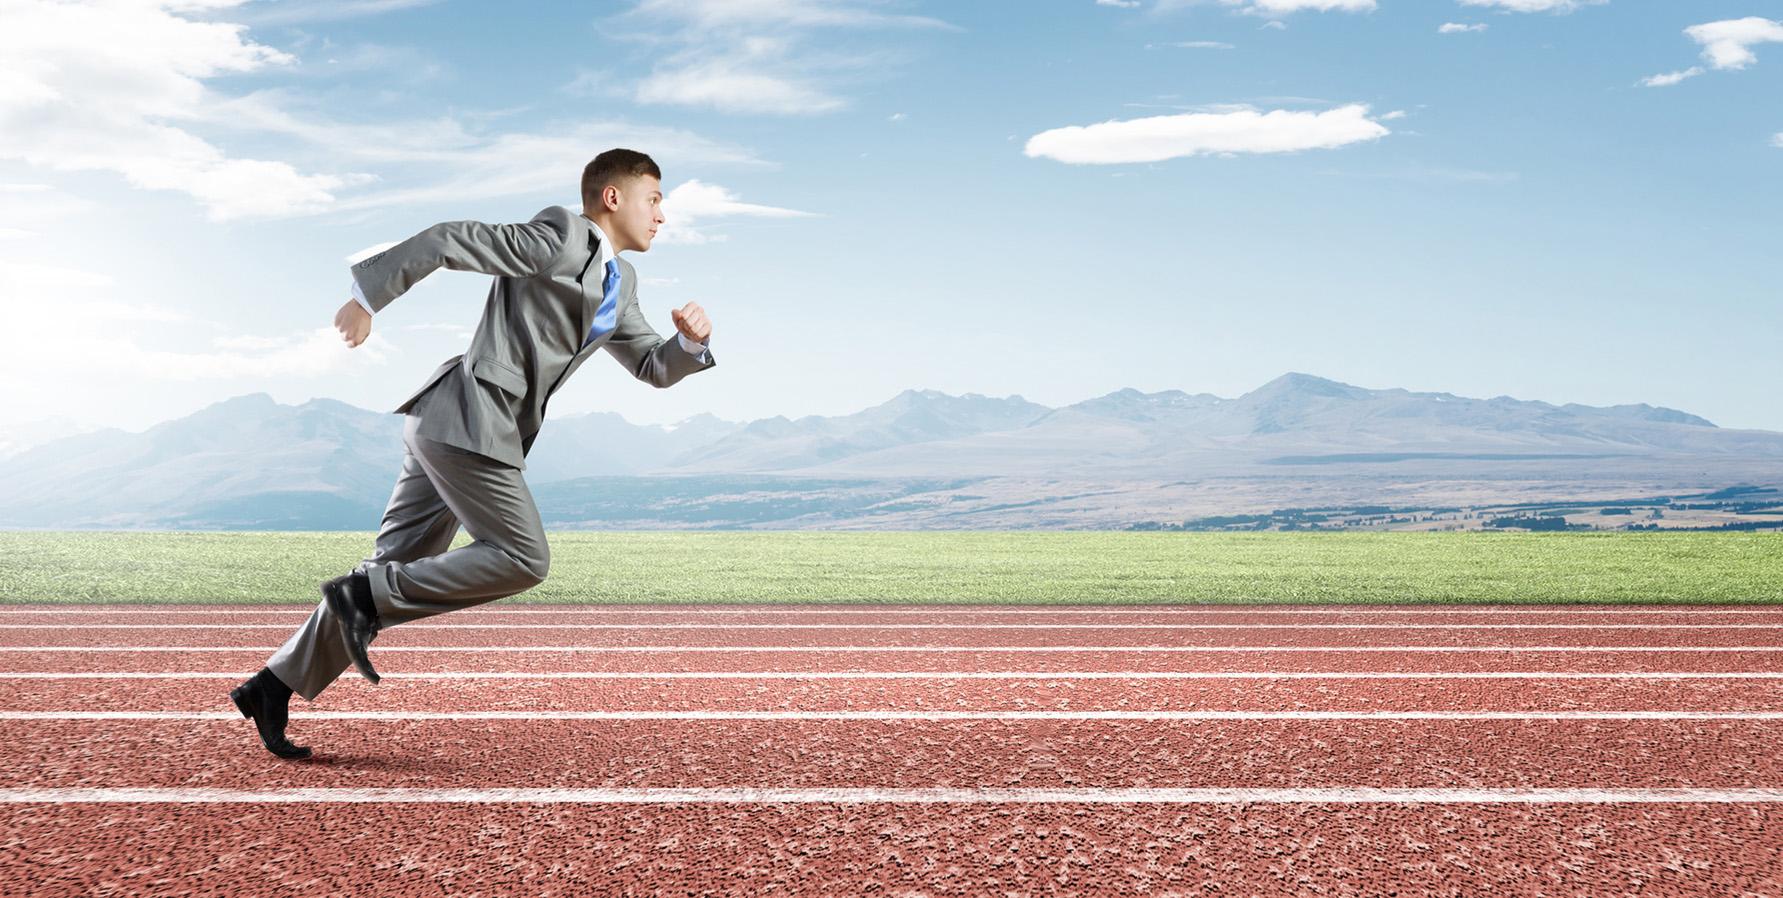 Image du slider - Homme en costume sur piste d'athlétisme